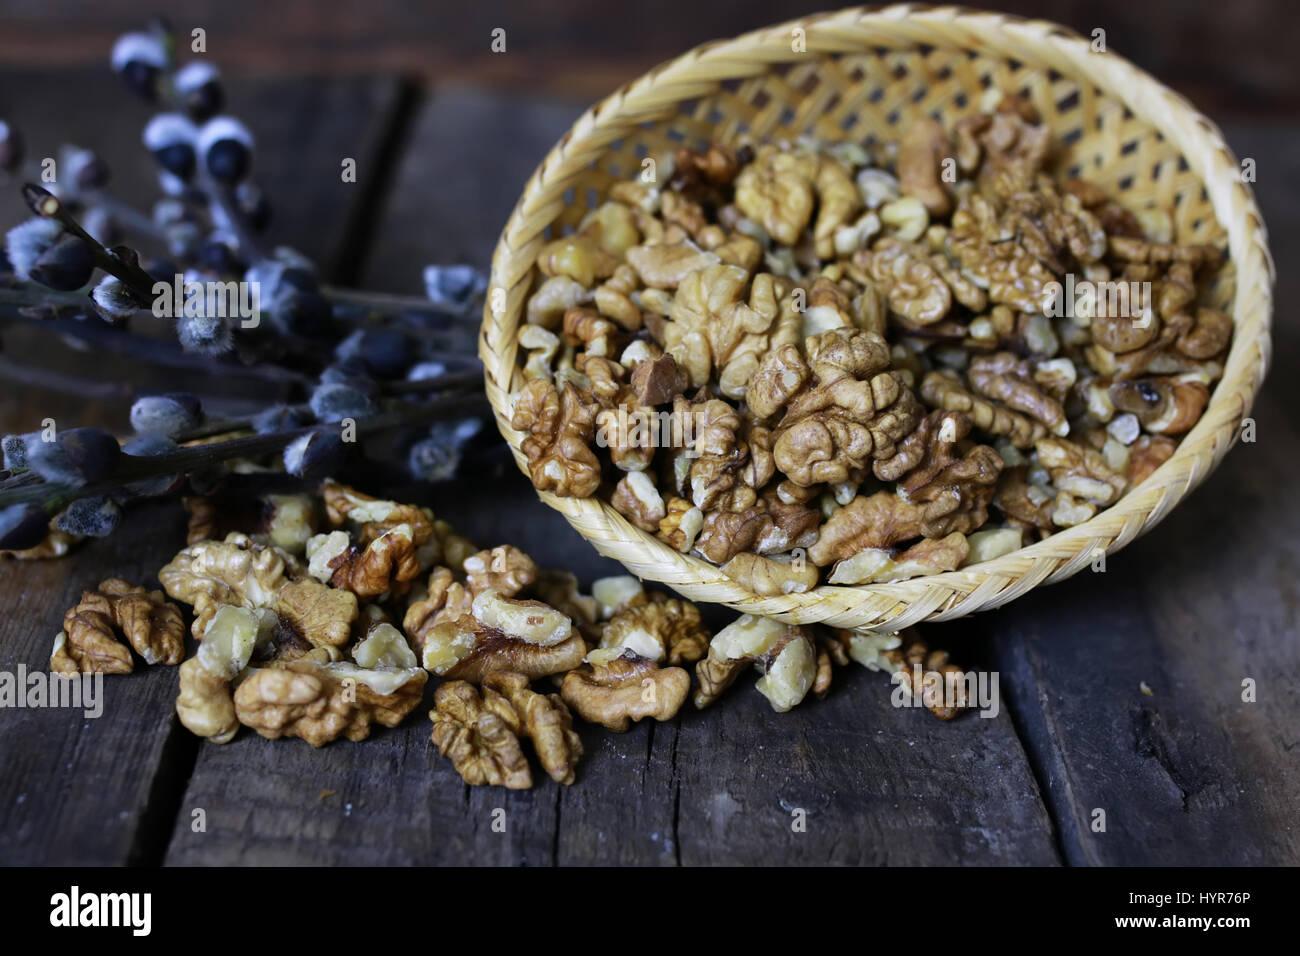 peeled walnut on a wooden background - Stock Image